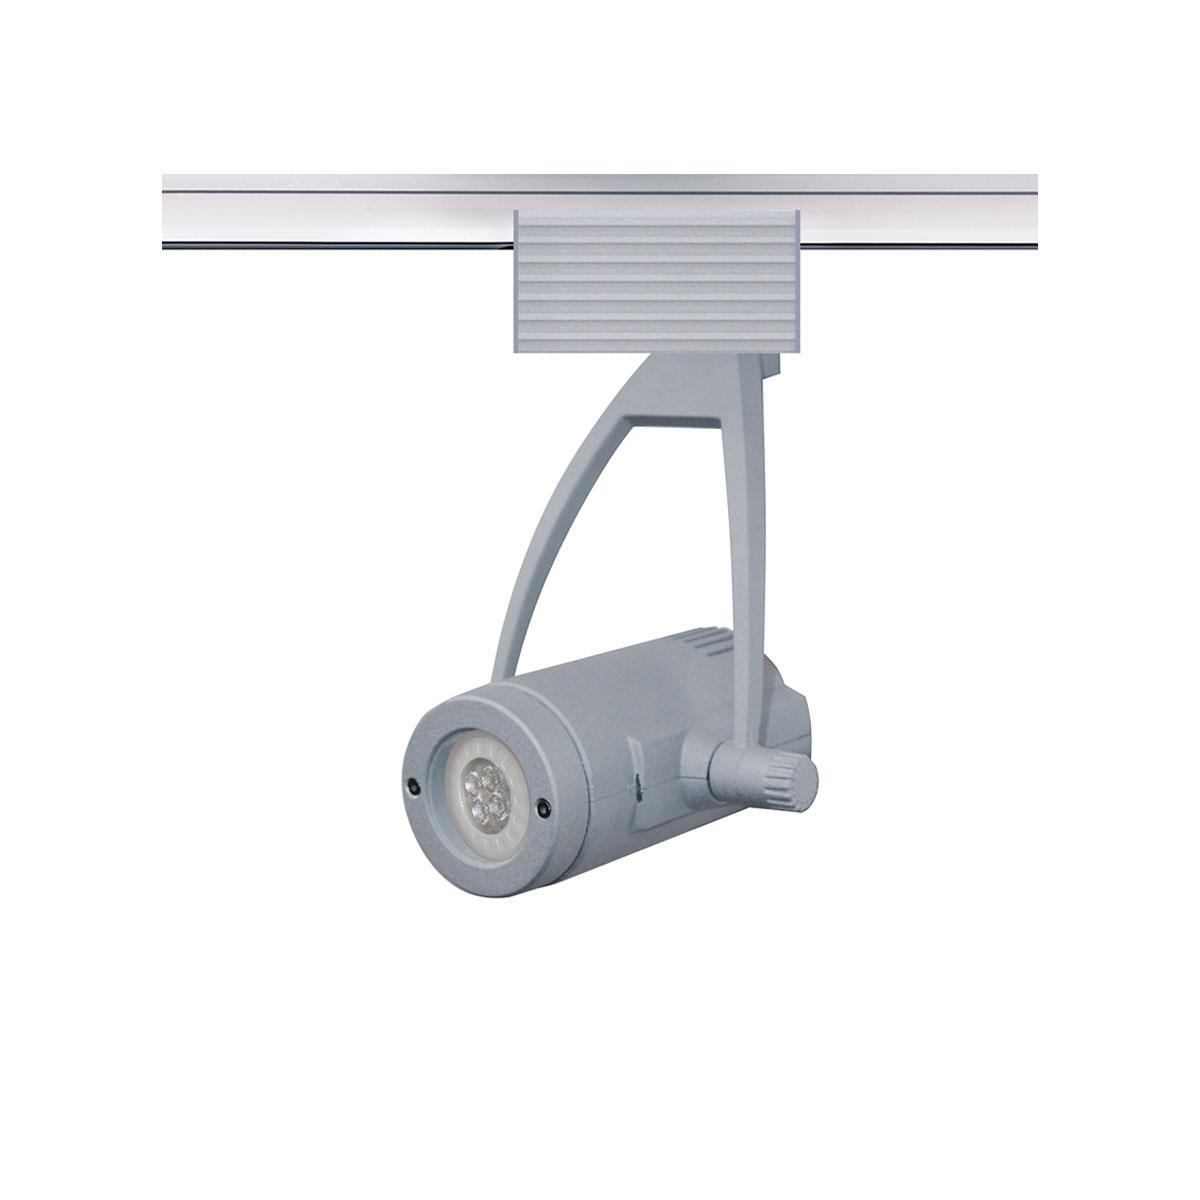 Proctom carril proyector interior secom iluminaci n - Sistemas de iluminacion interior ...